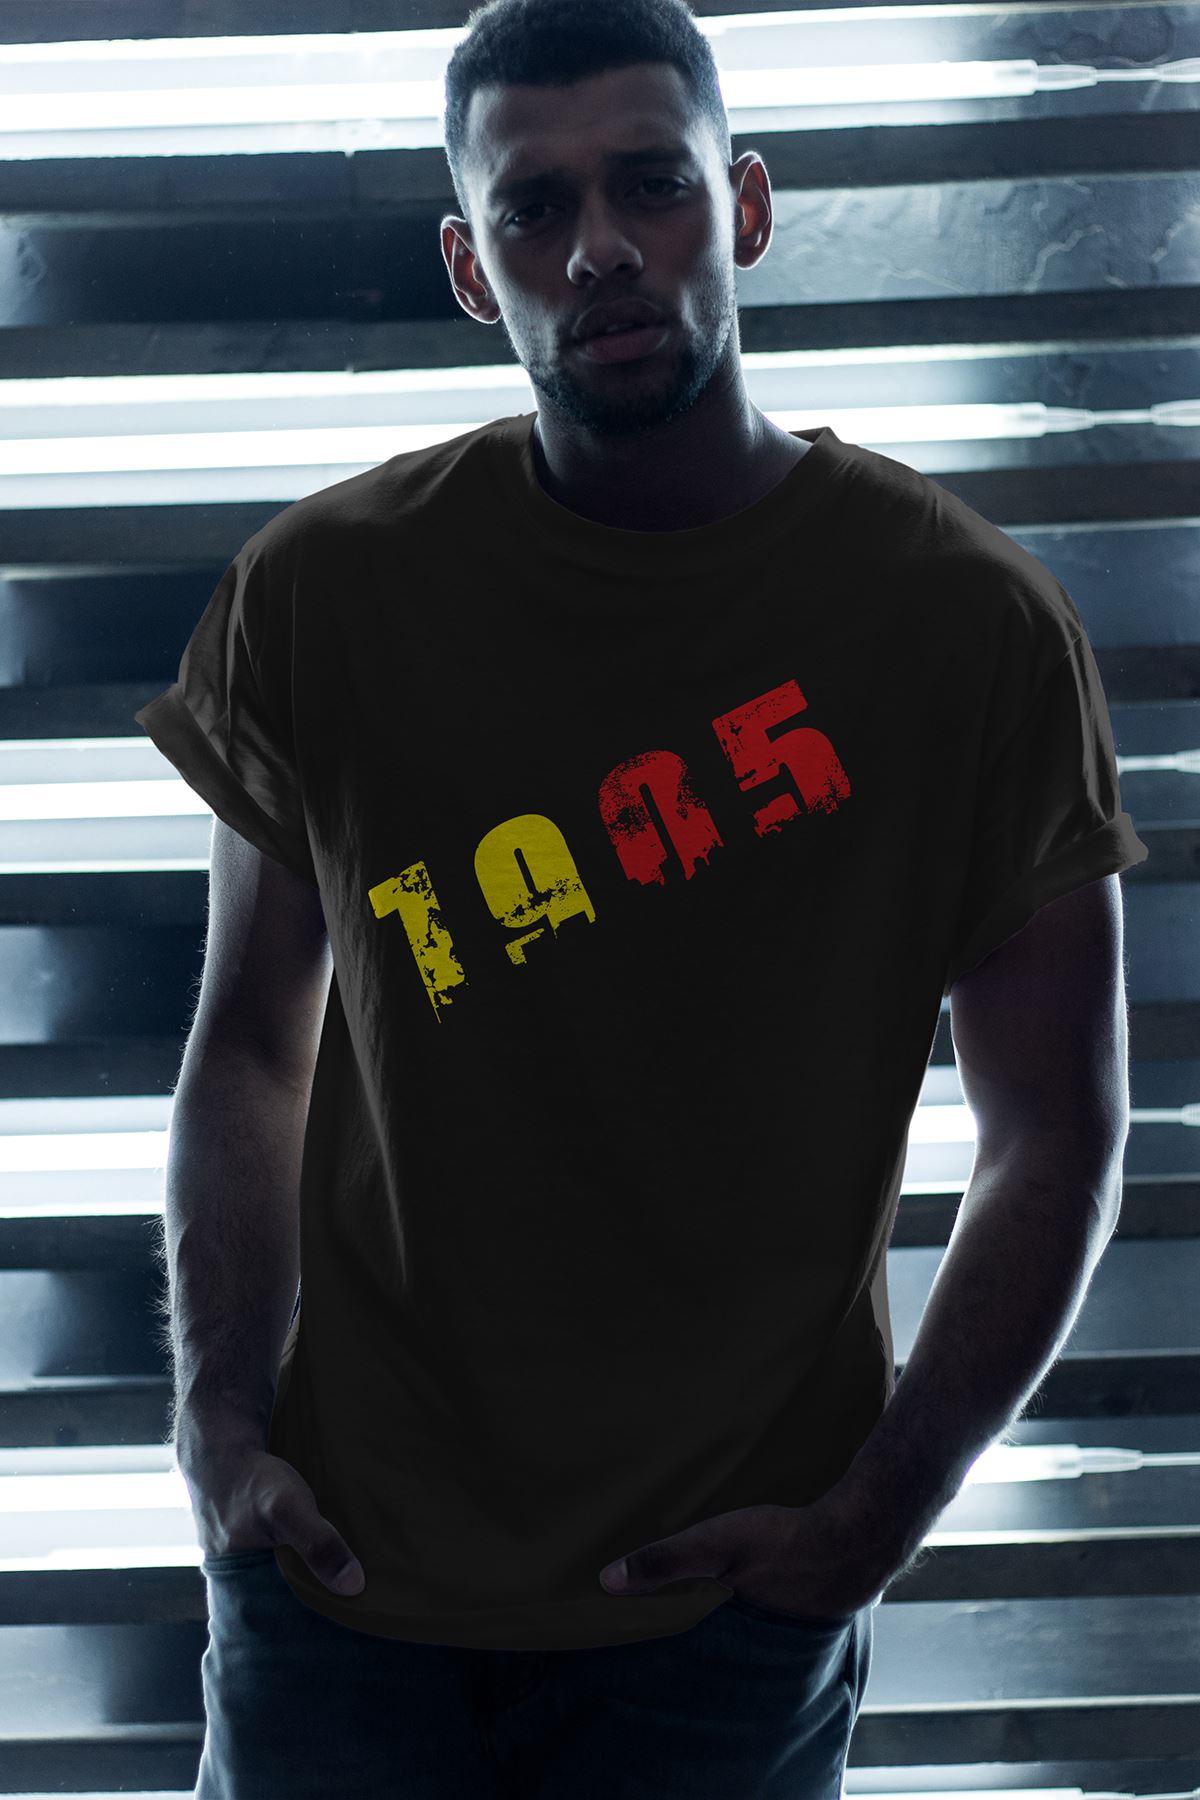 1905 GS Siyah Erkek Oversize Tshirt - Tişört